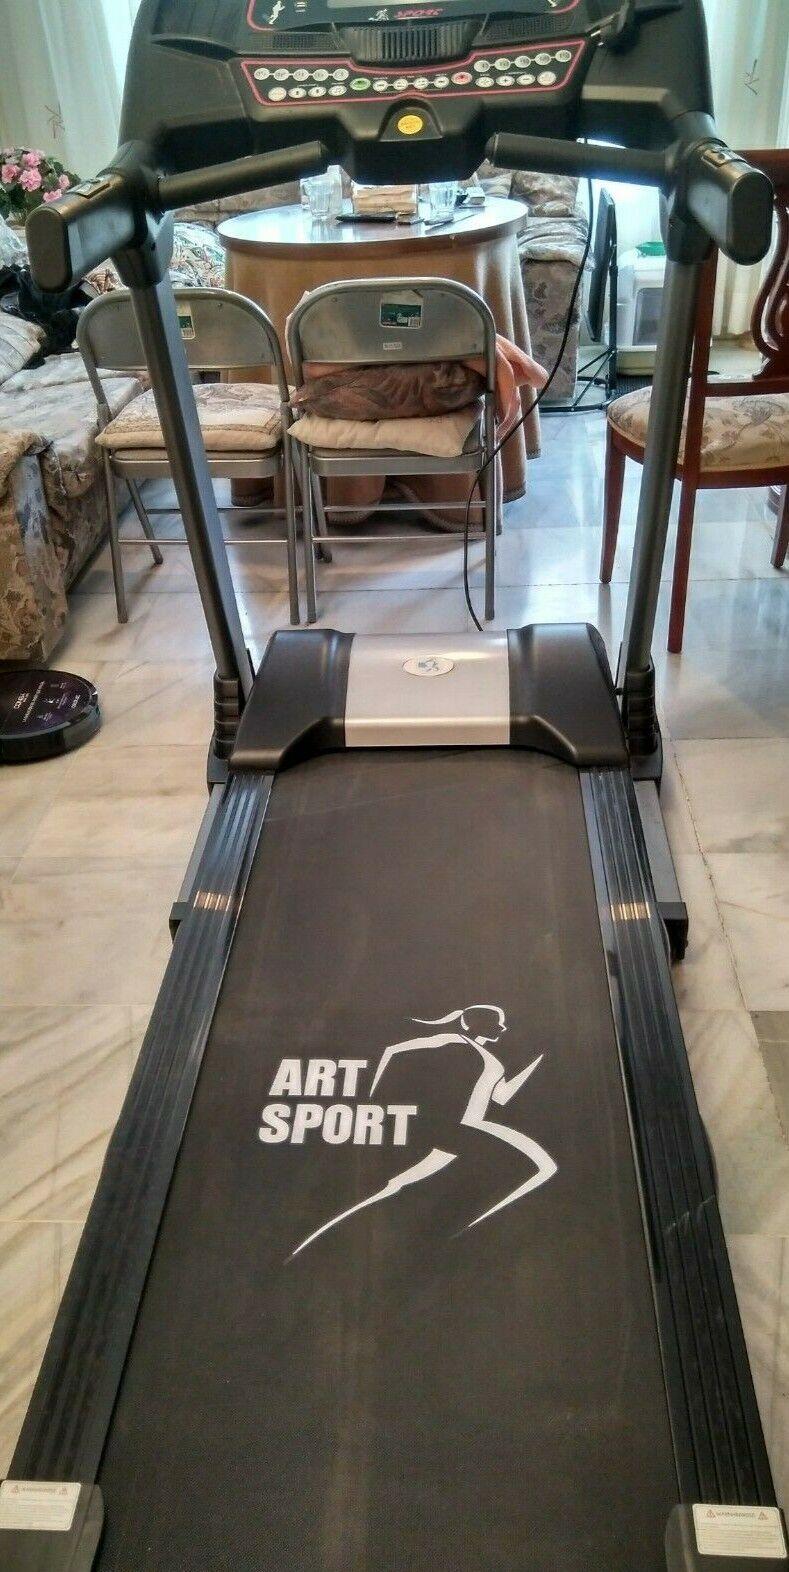 Cinta de correr profesional Art Sport hasta 22km/h muy poco uso